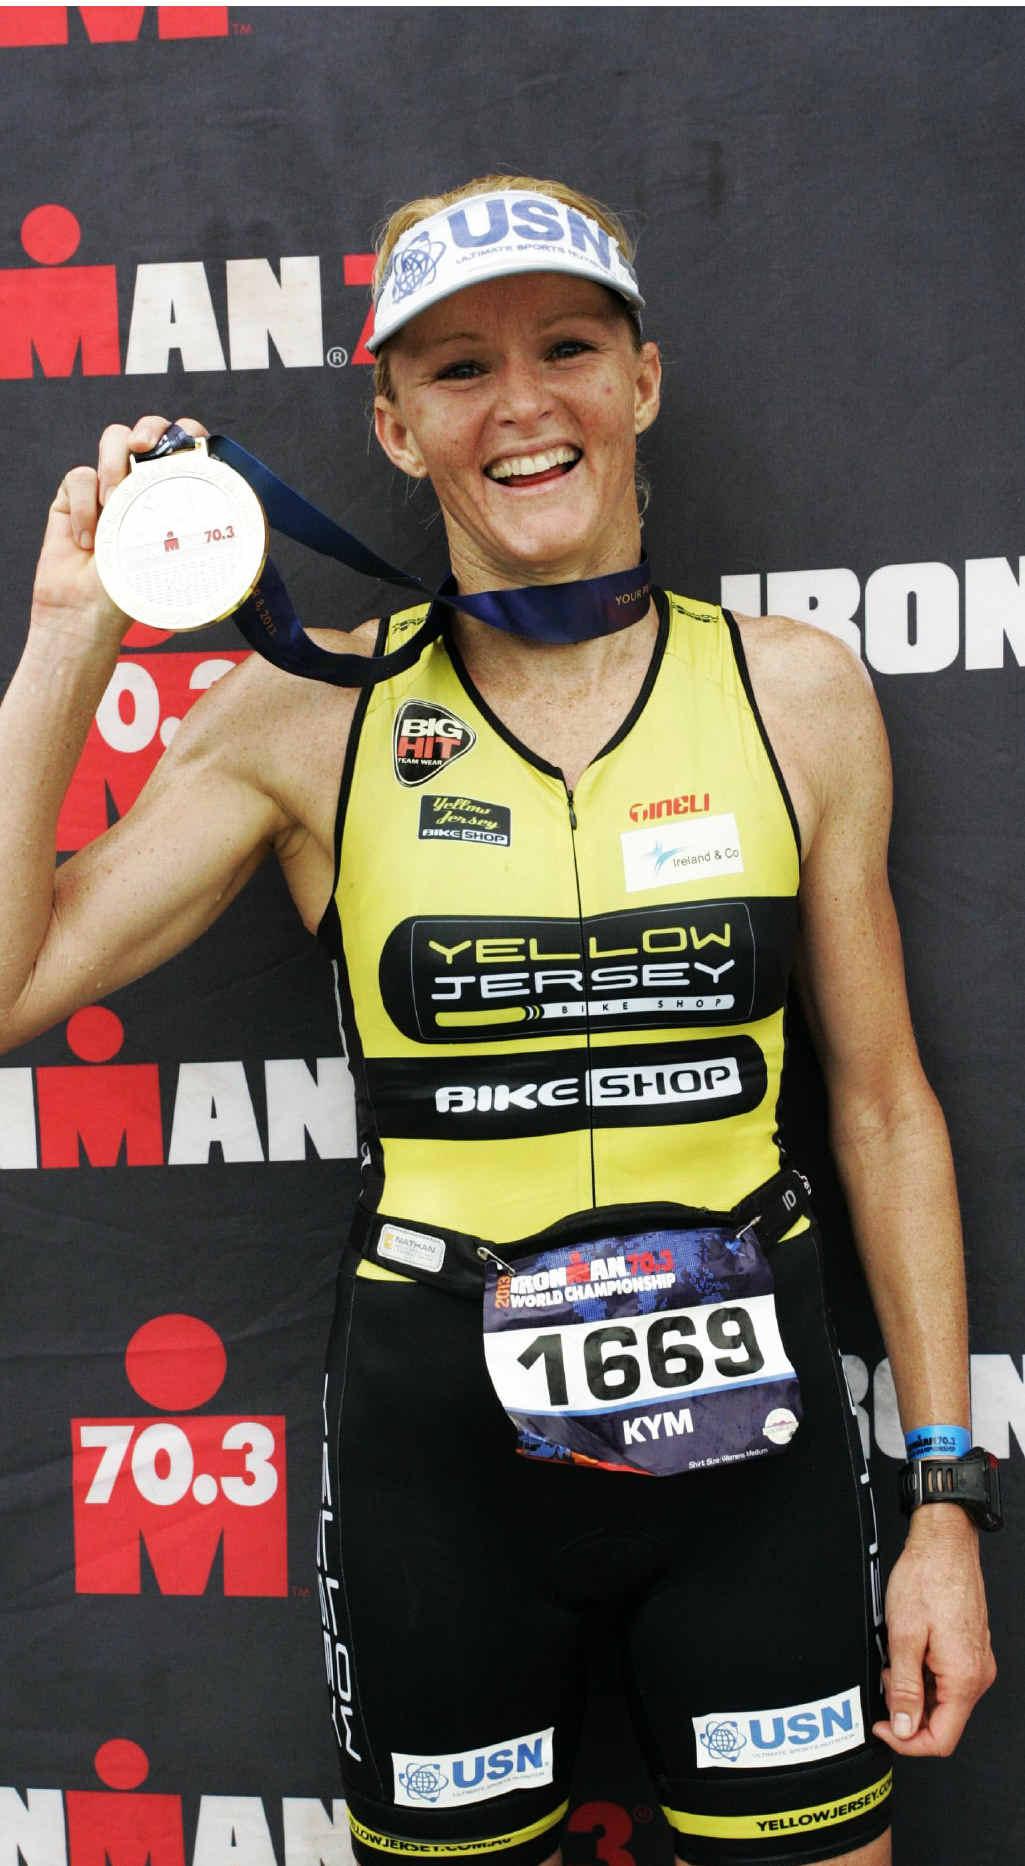 MEDAL JOY: World champion Kym Jaenke savours her latest international medal won this time in Las Vegas.